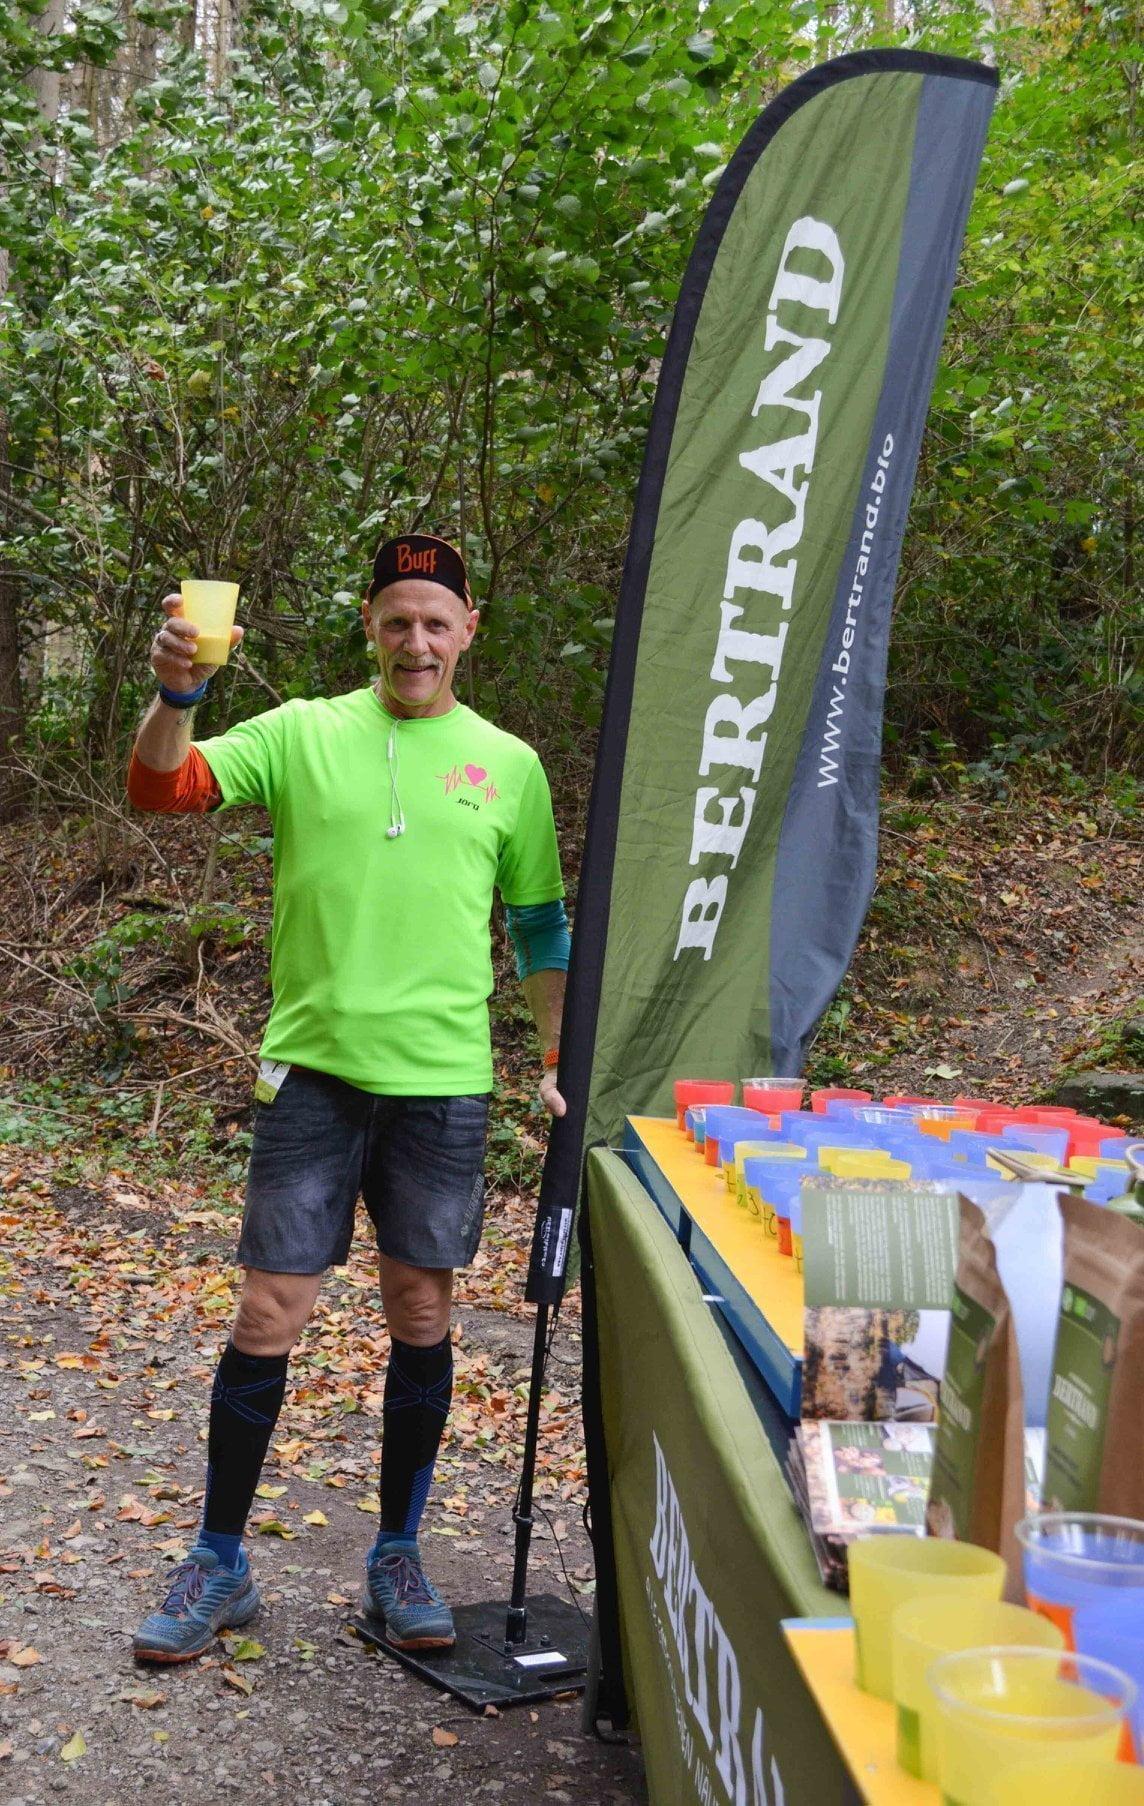 6-hour run in Werl